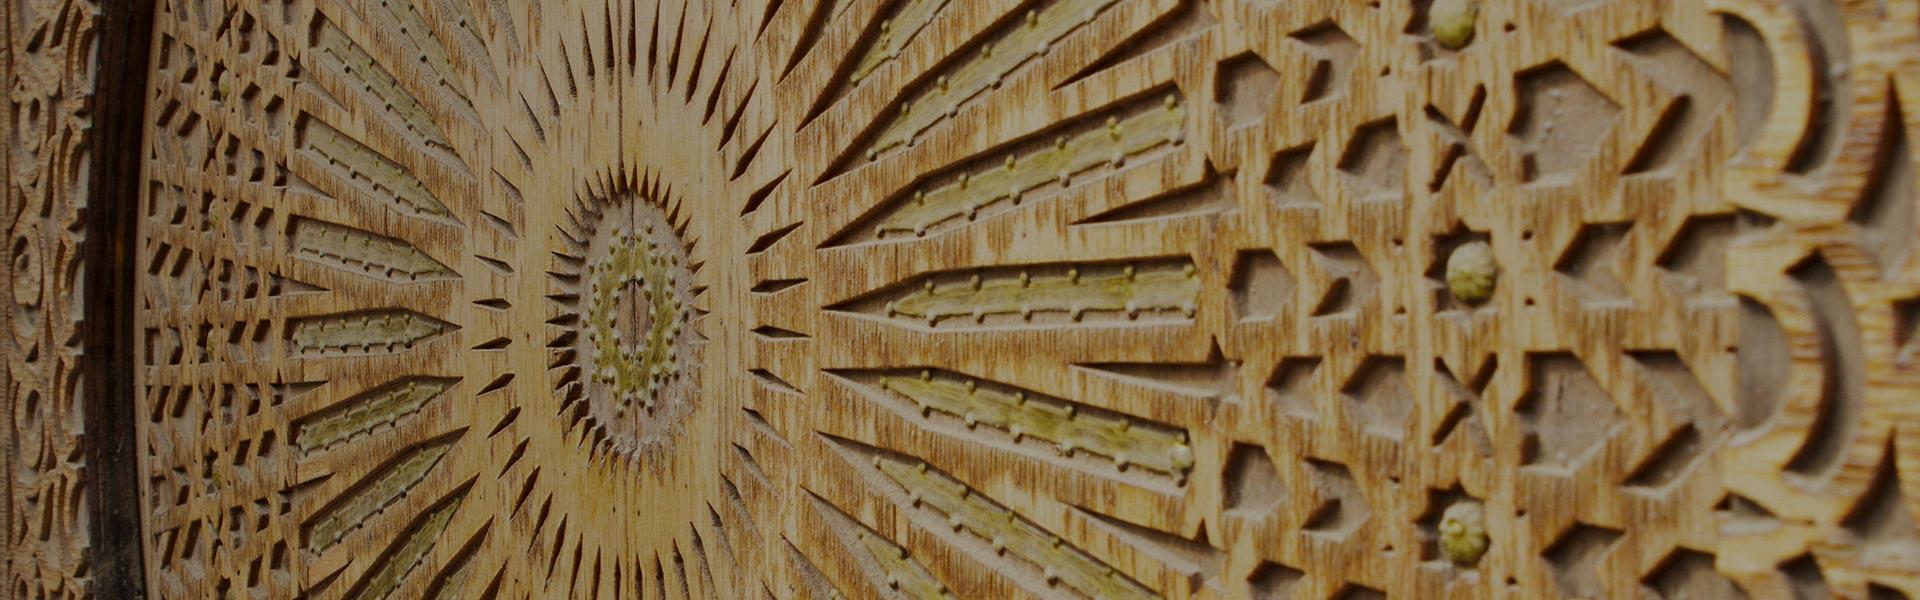 Elaborate wooden door in Abu Dhabi